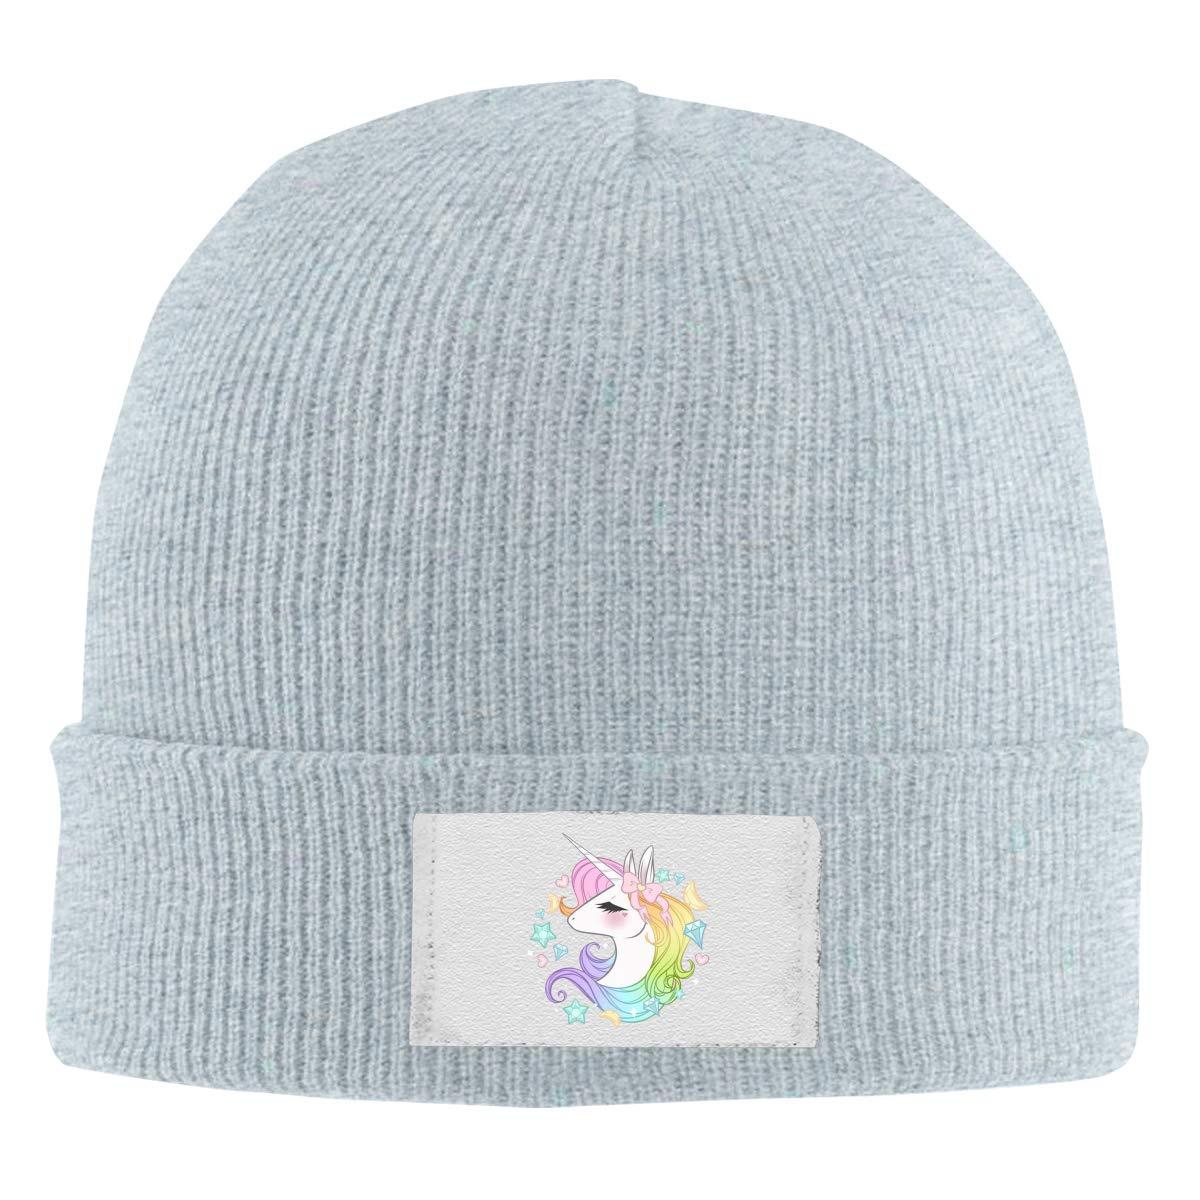 Stretchy Cuff Beanie Hat Black Dunpaiaa Skull Caps Cute Unicorns Winter Warm Knit Hats